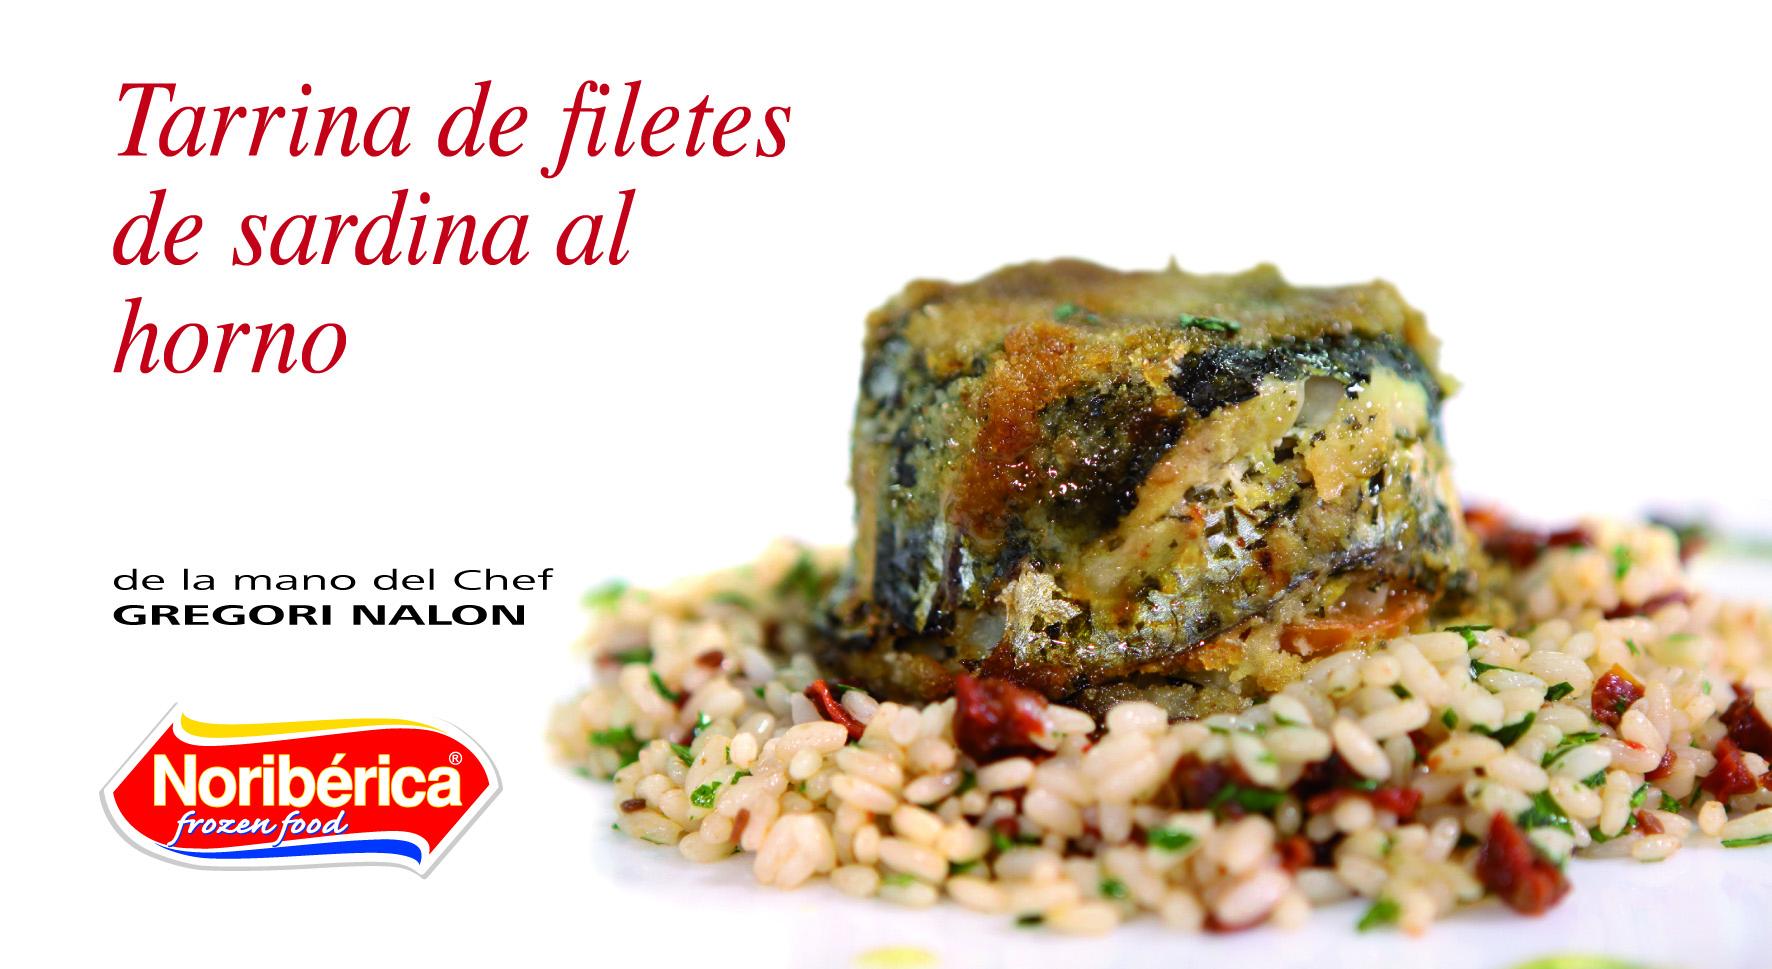 filetes de sardina al horno